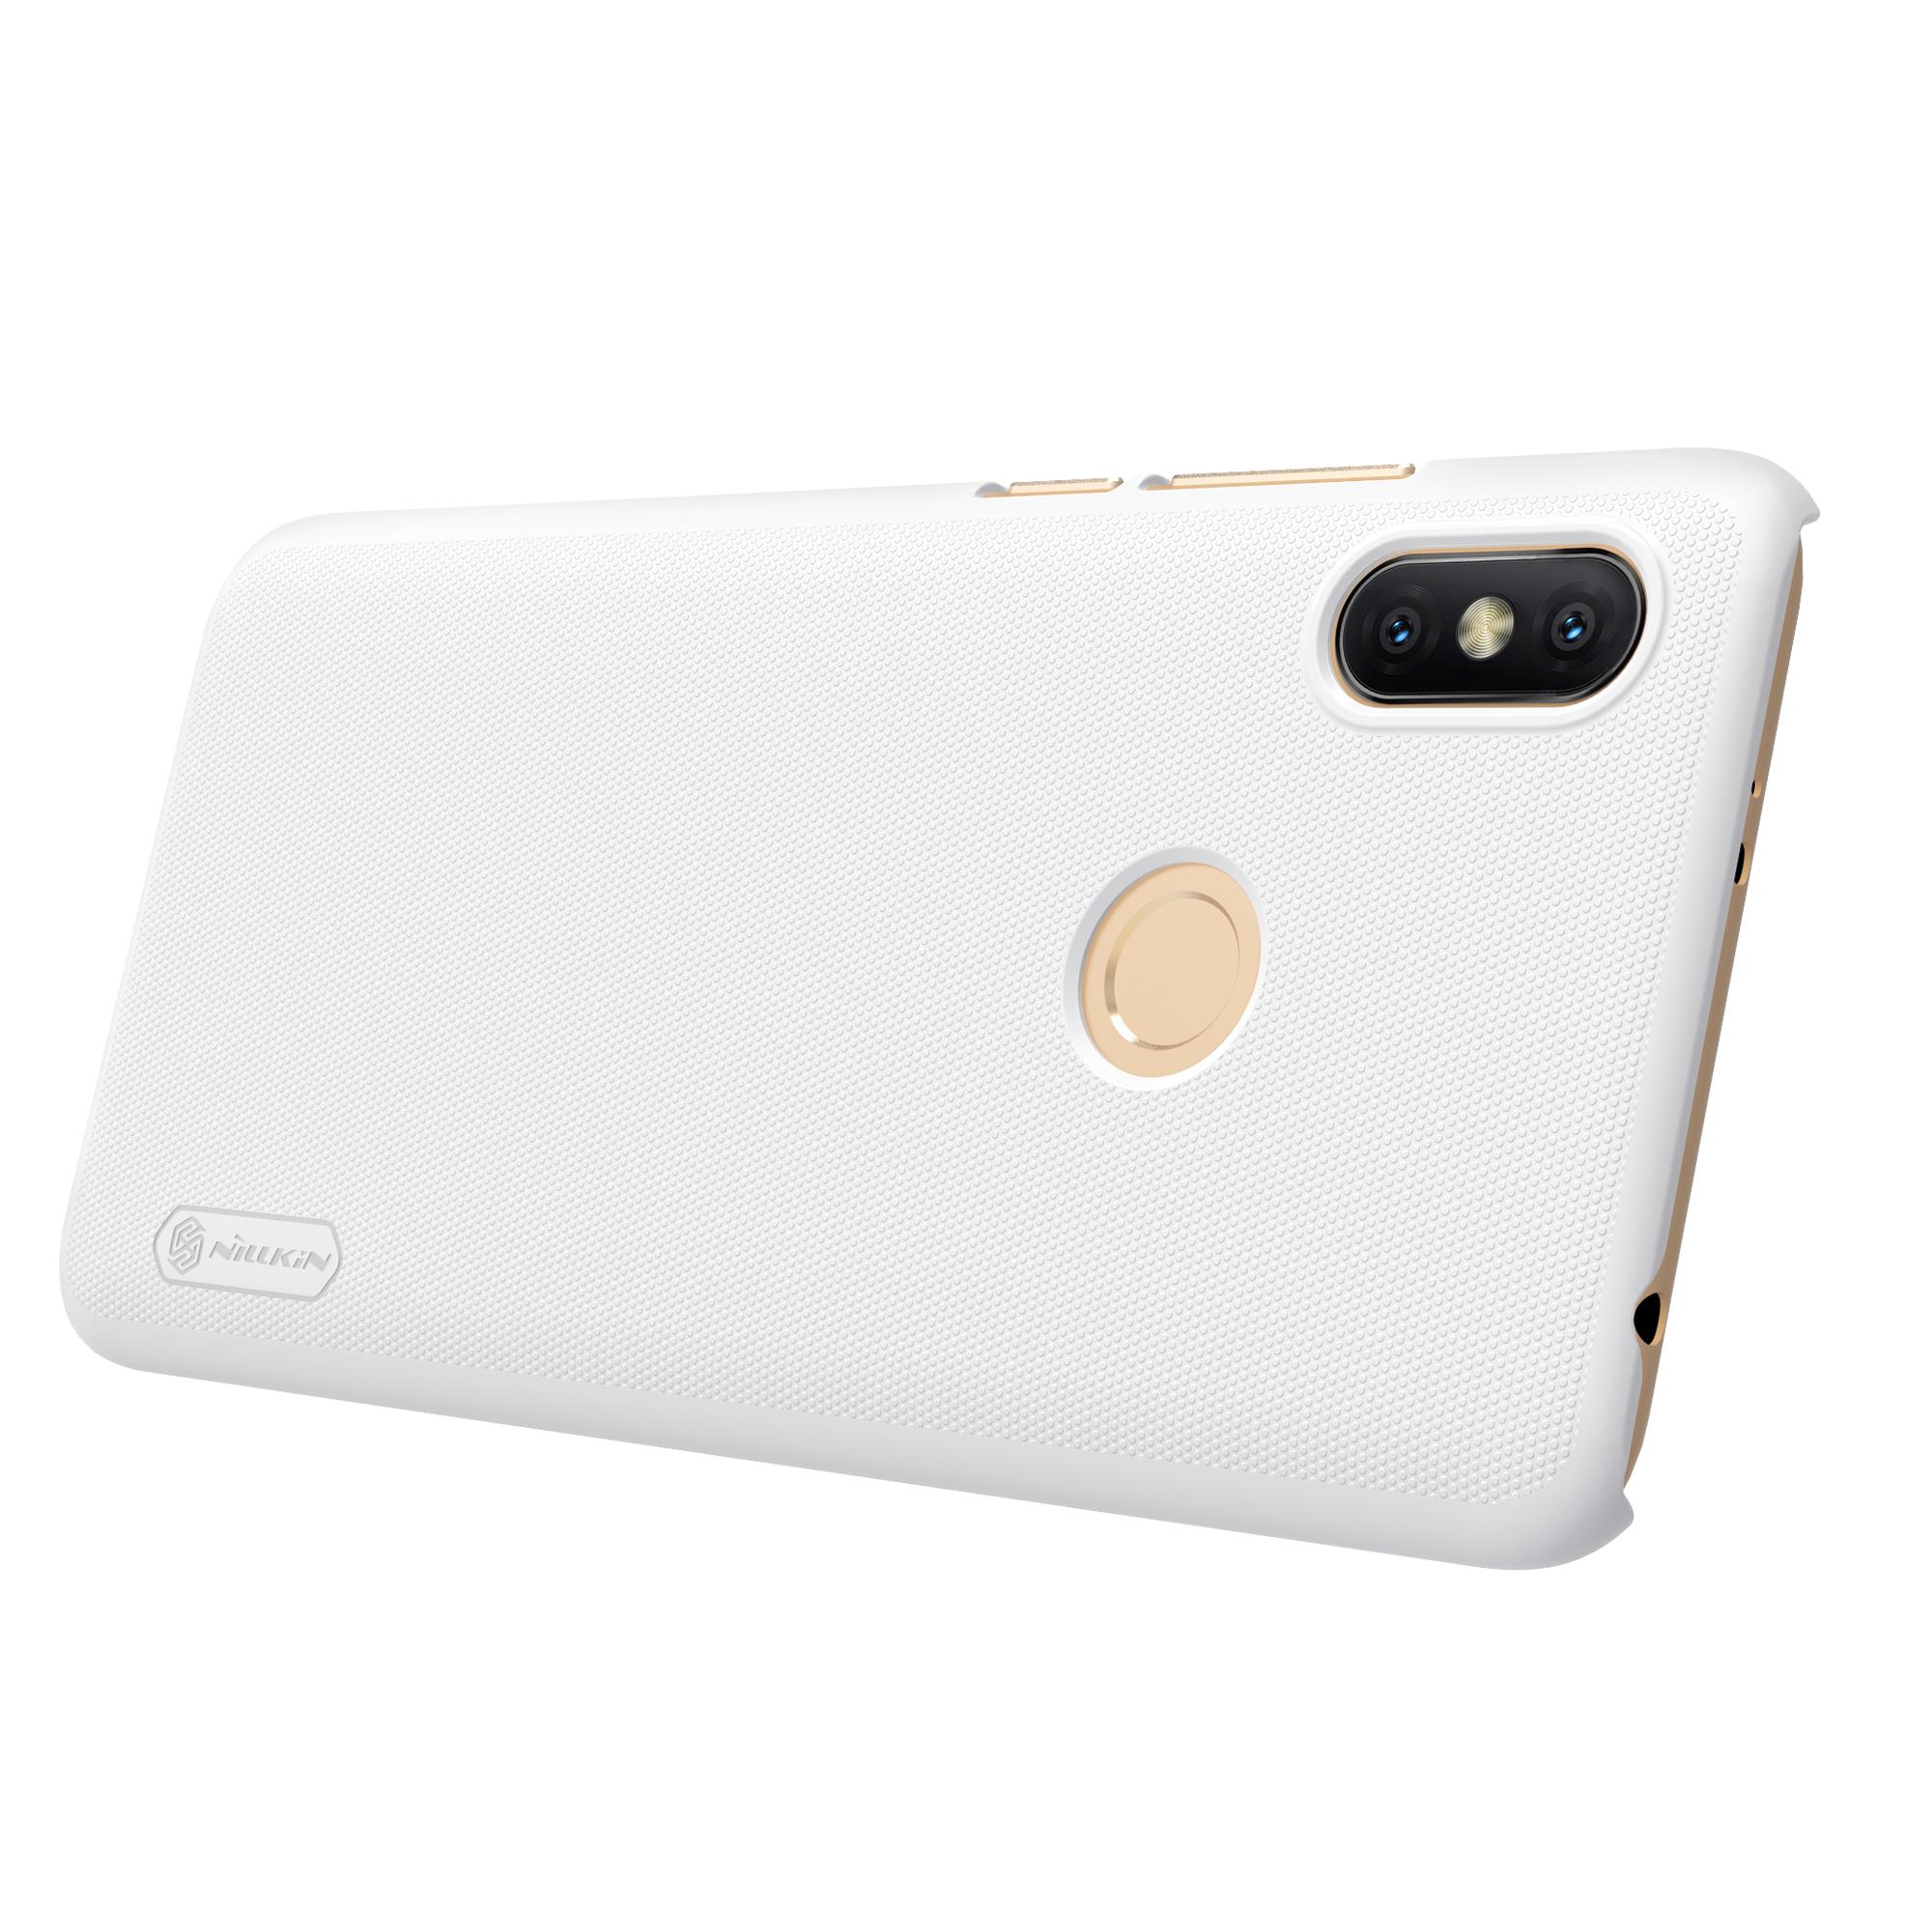 Чехол для сотового телефона Nillkin Накладка Frosted Xiaomi Redmi S2 White, белый